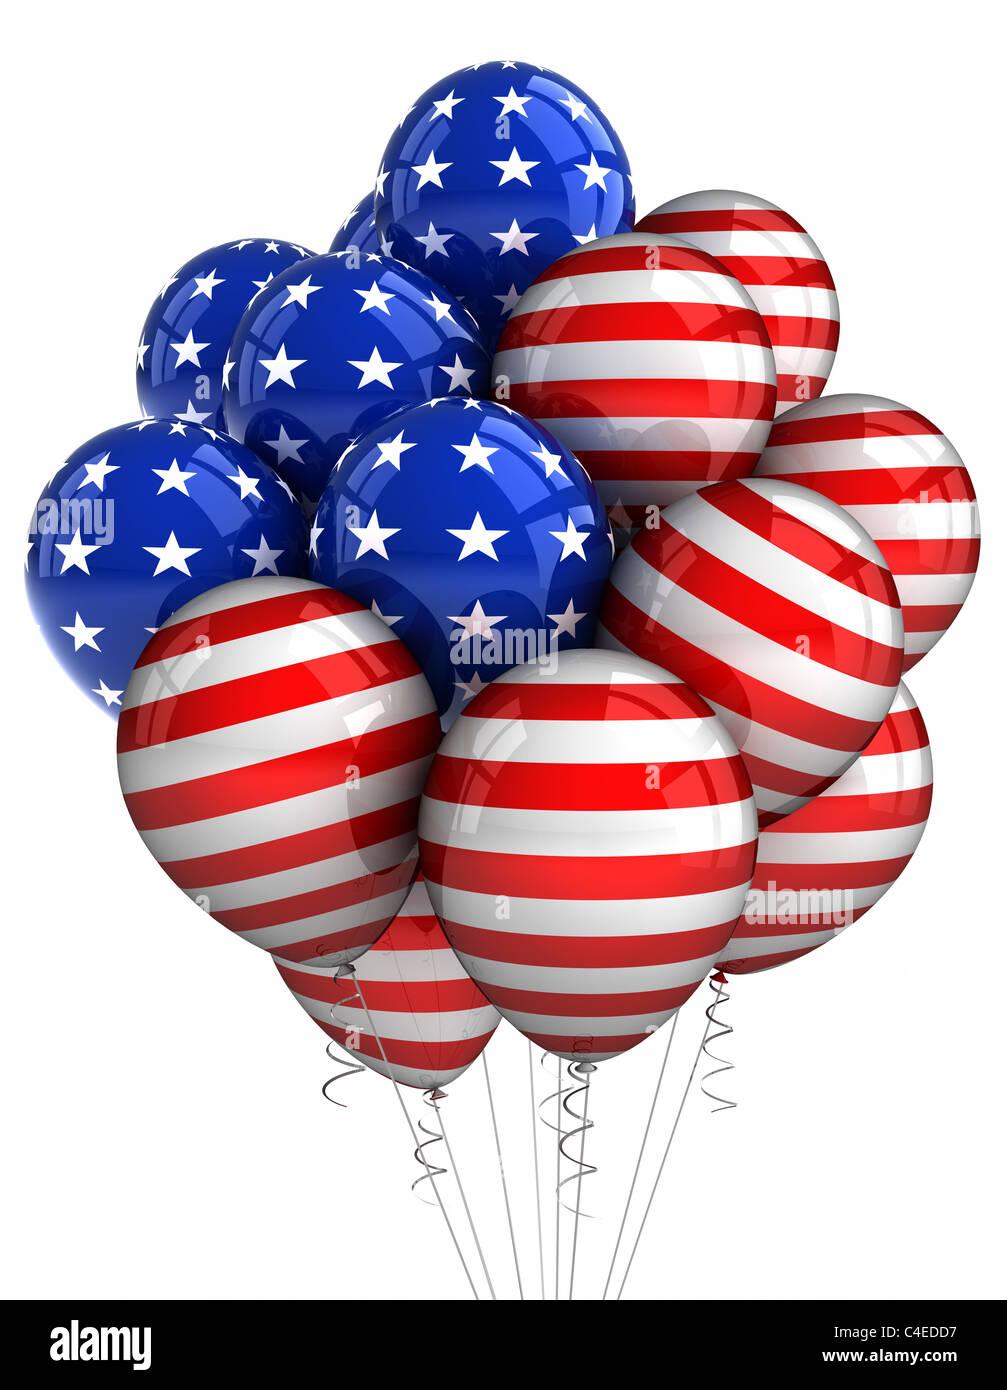 American patriotic balloons - Stock Image